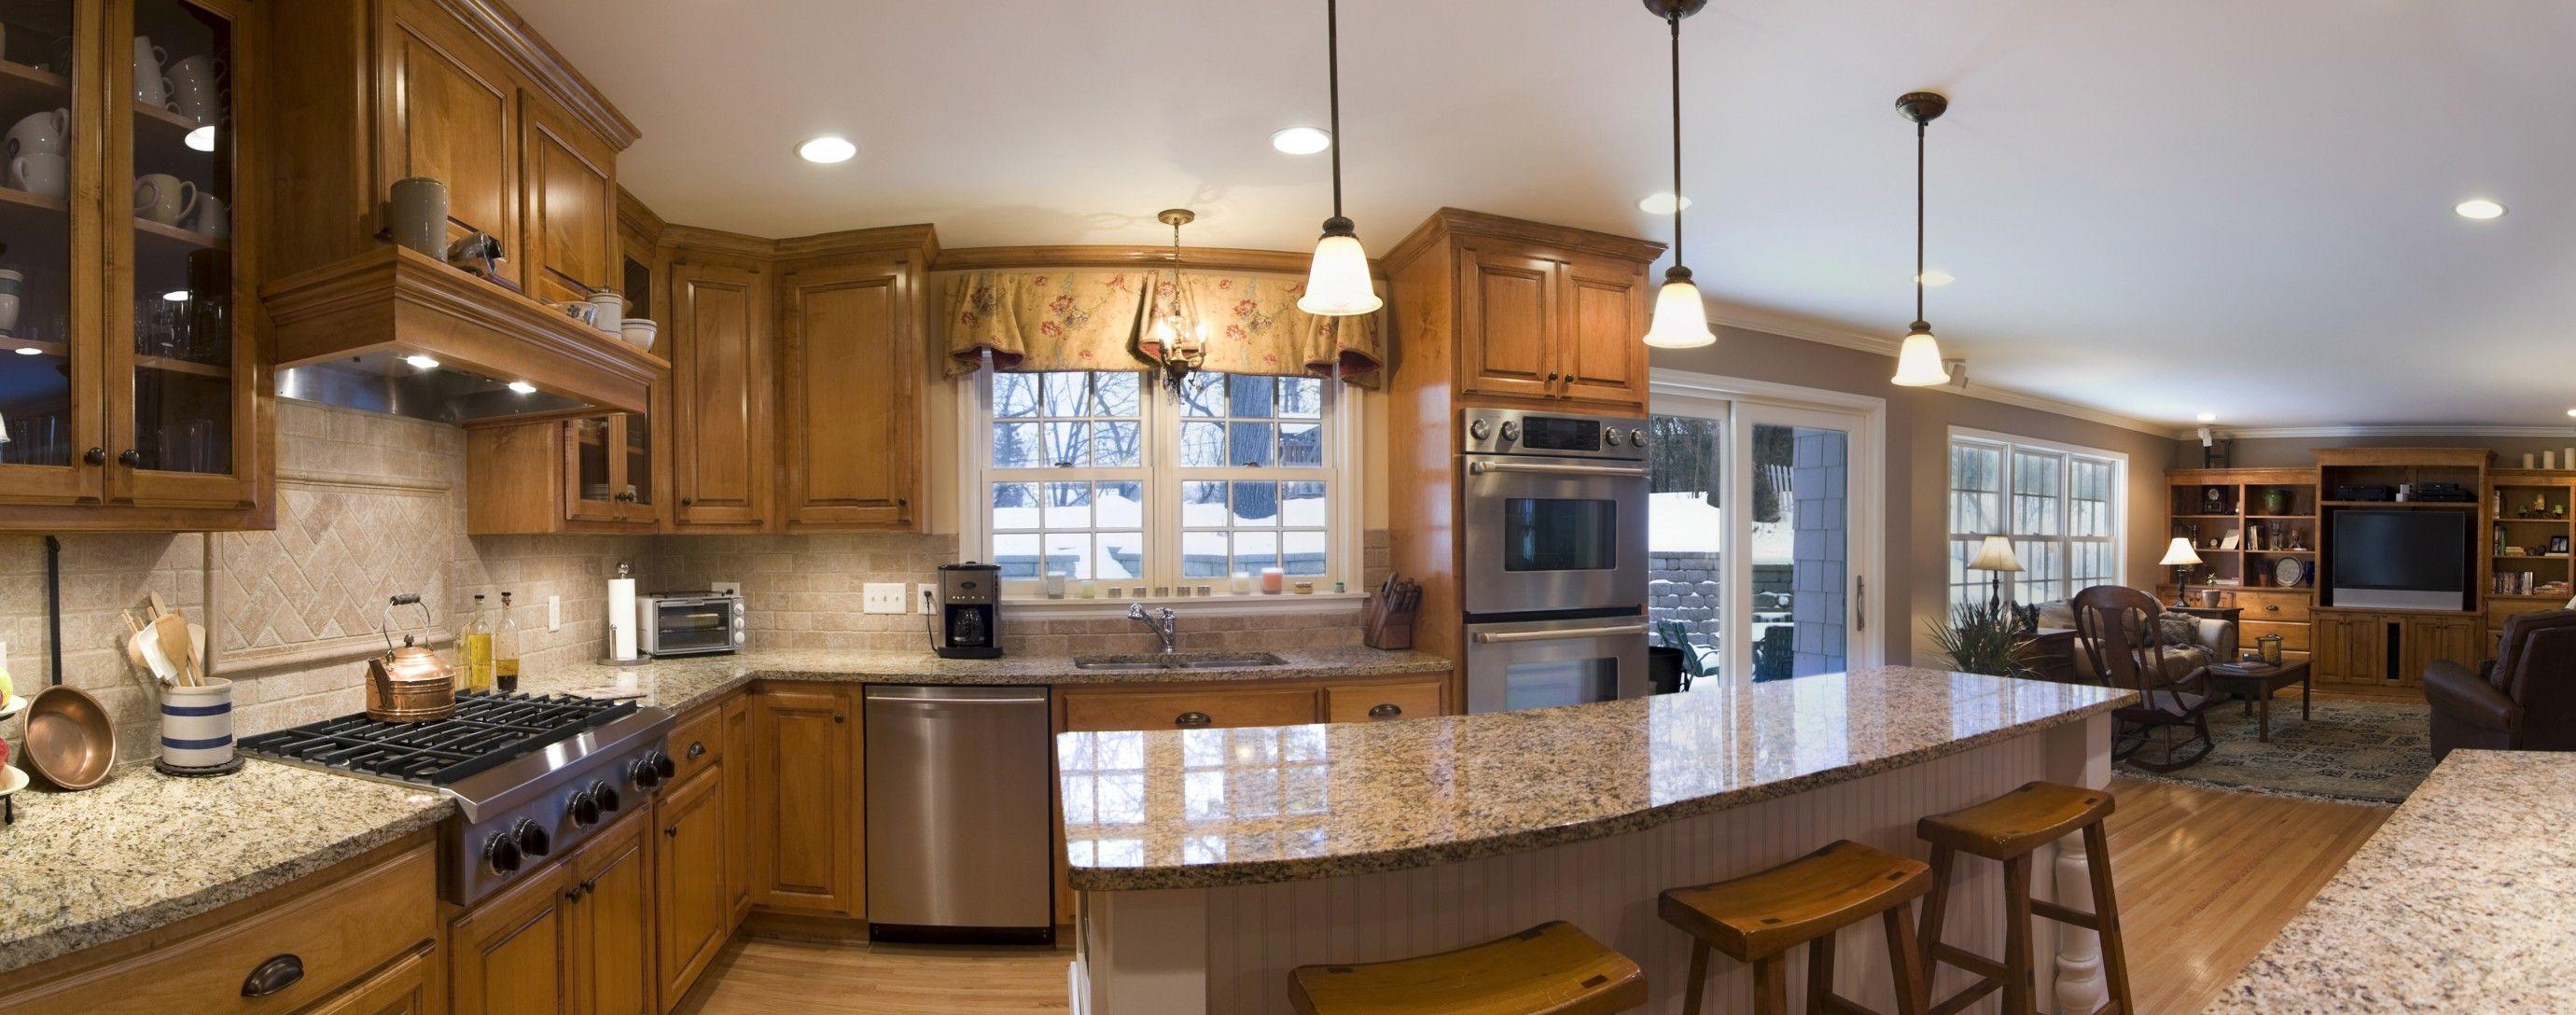 kitchen island lamps open large kitchen design unique rounded